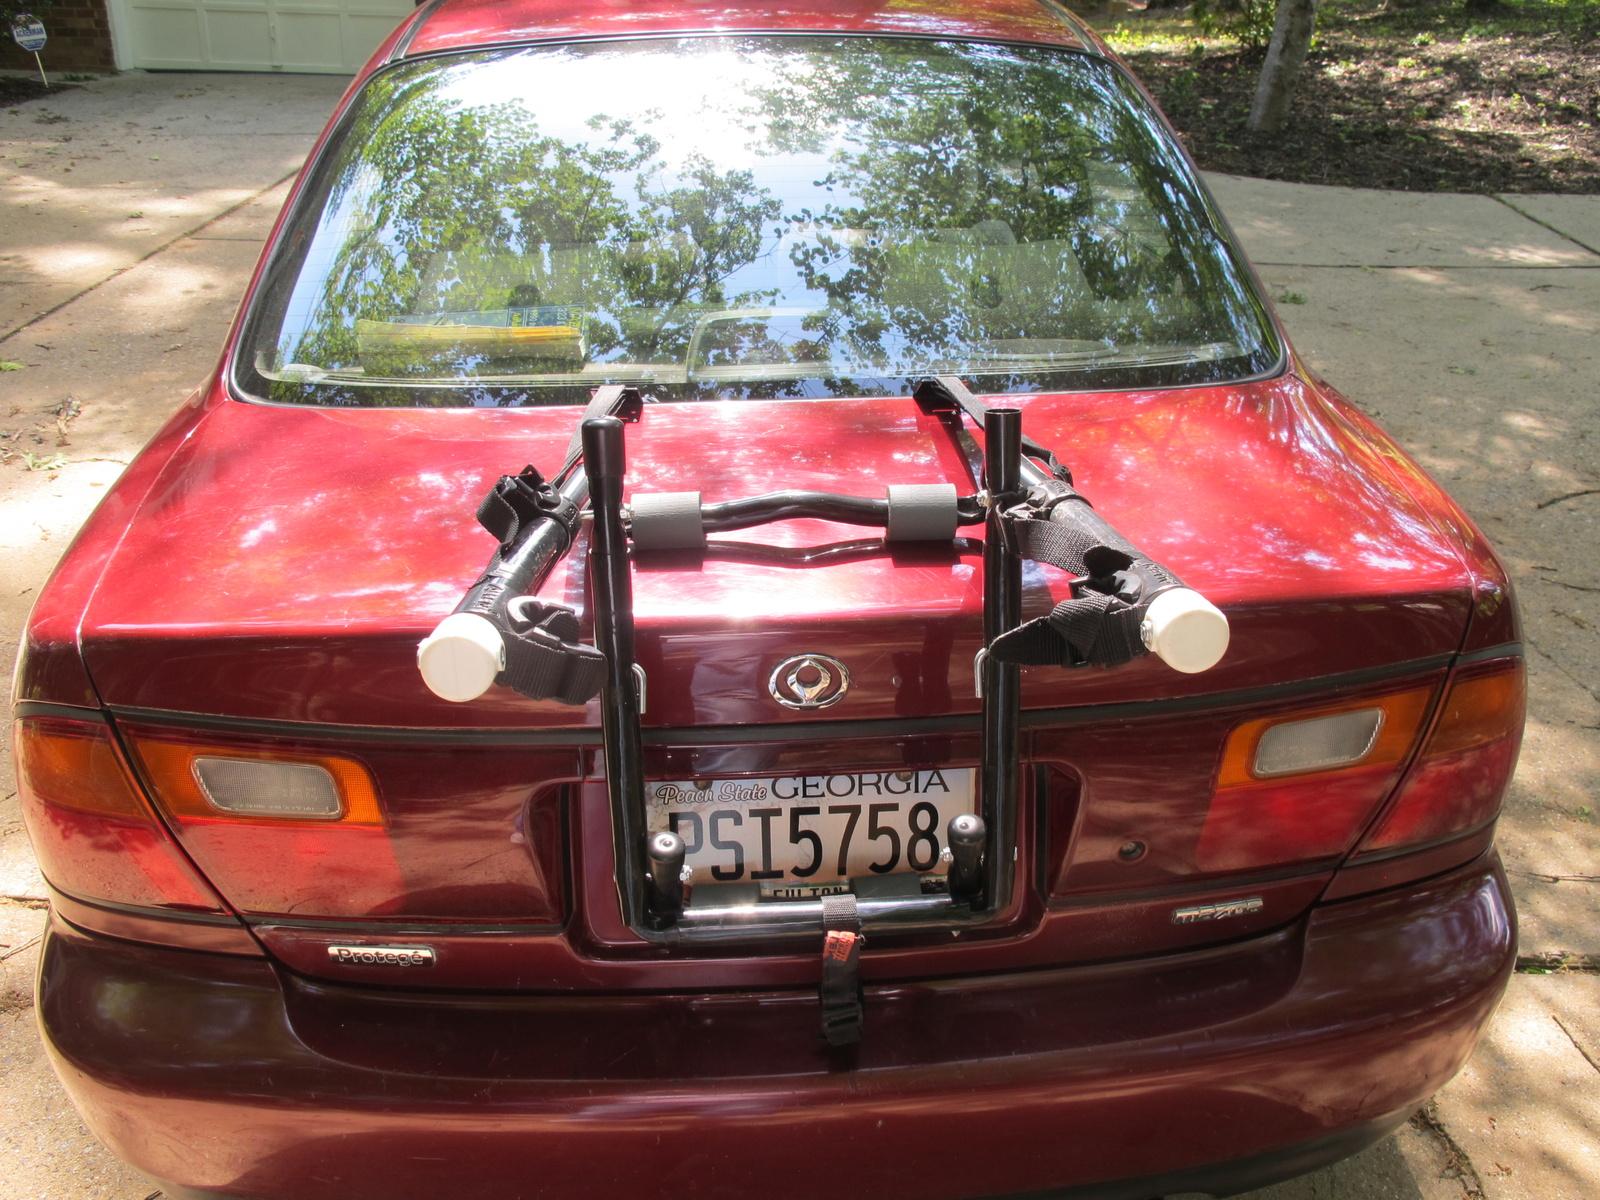 1996 Mazda Protege Overview Cargurus 2002 626 Fuel Filter Location